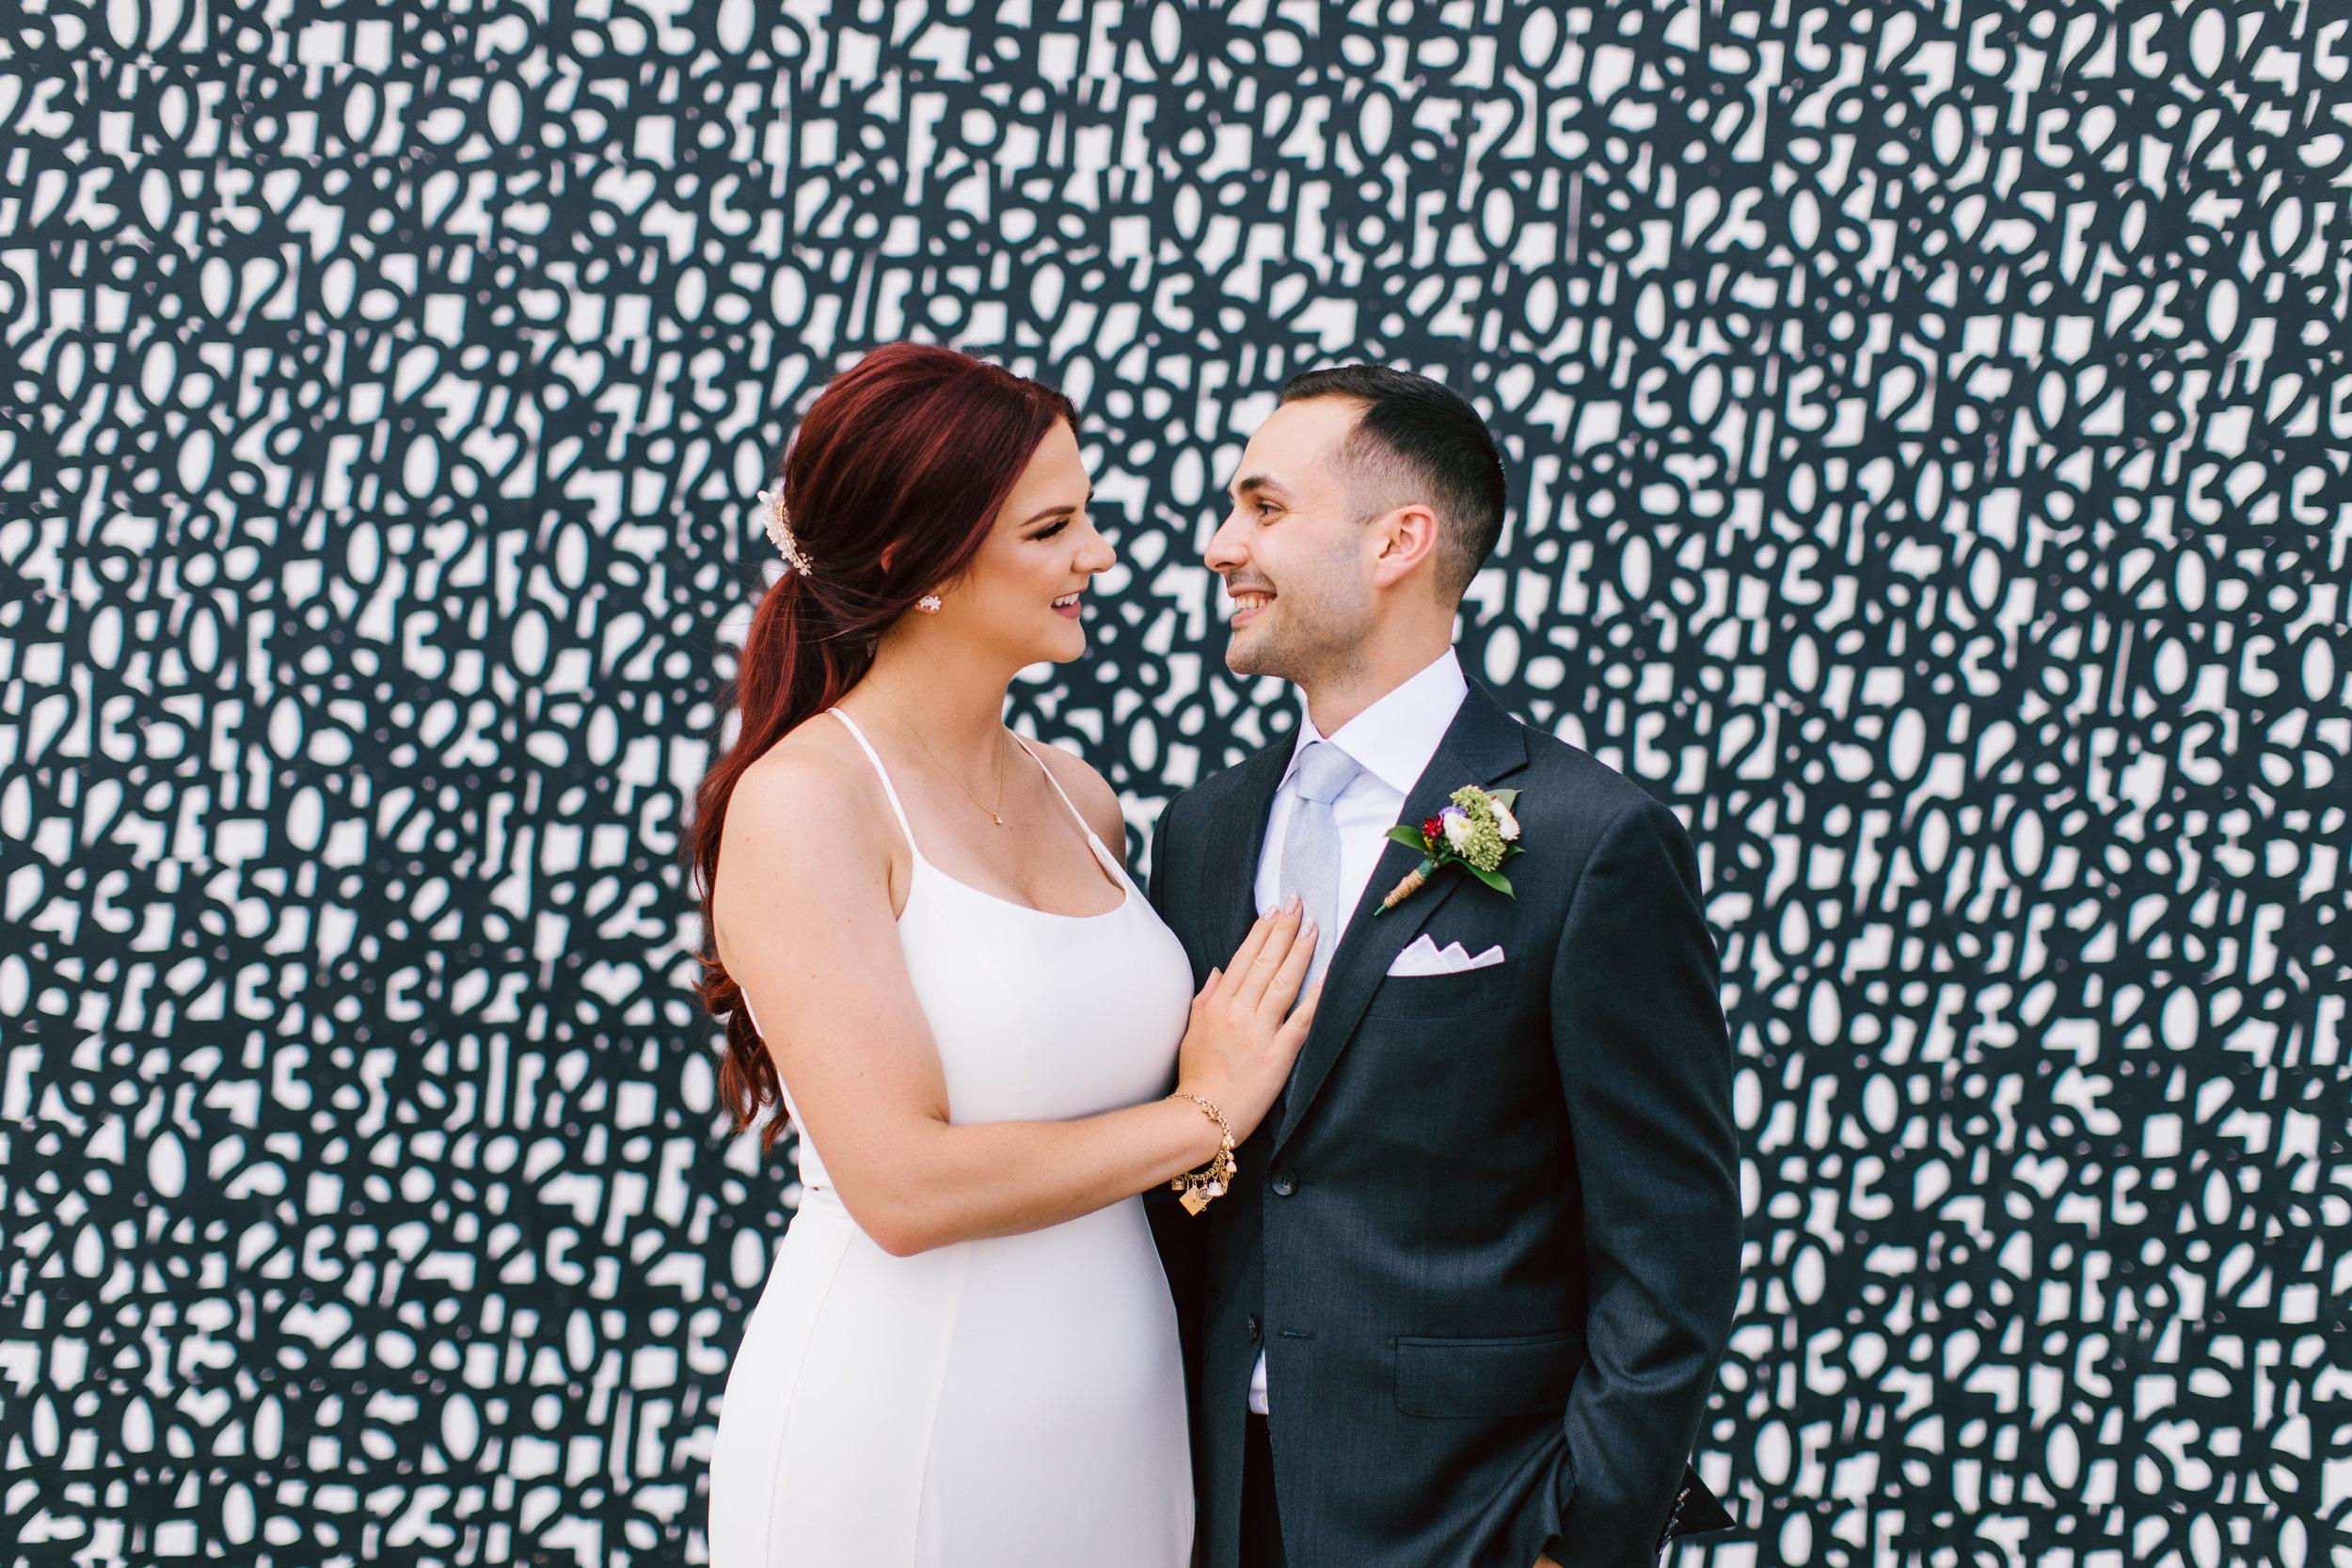 The-Asbury-Hotel-Wedding-Peaberry-Photography-Pennsylvania-Wedding-Photographer-Philadelphia-New-Jersey-001.jpg